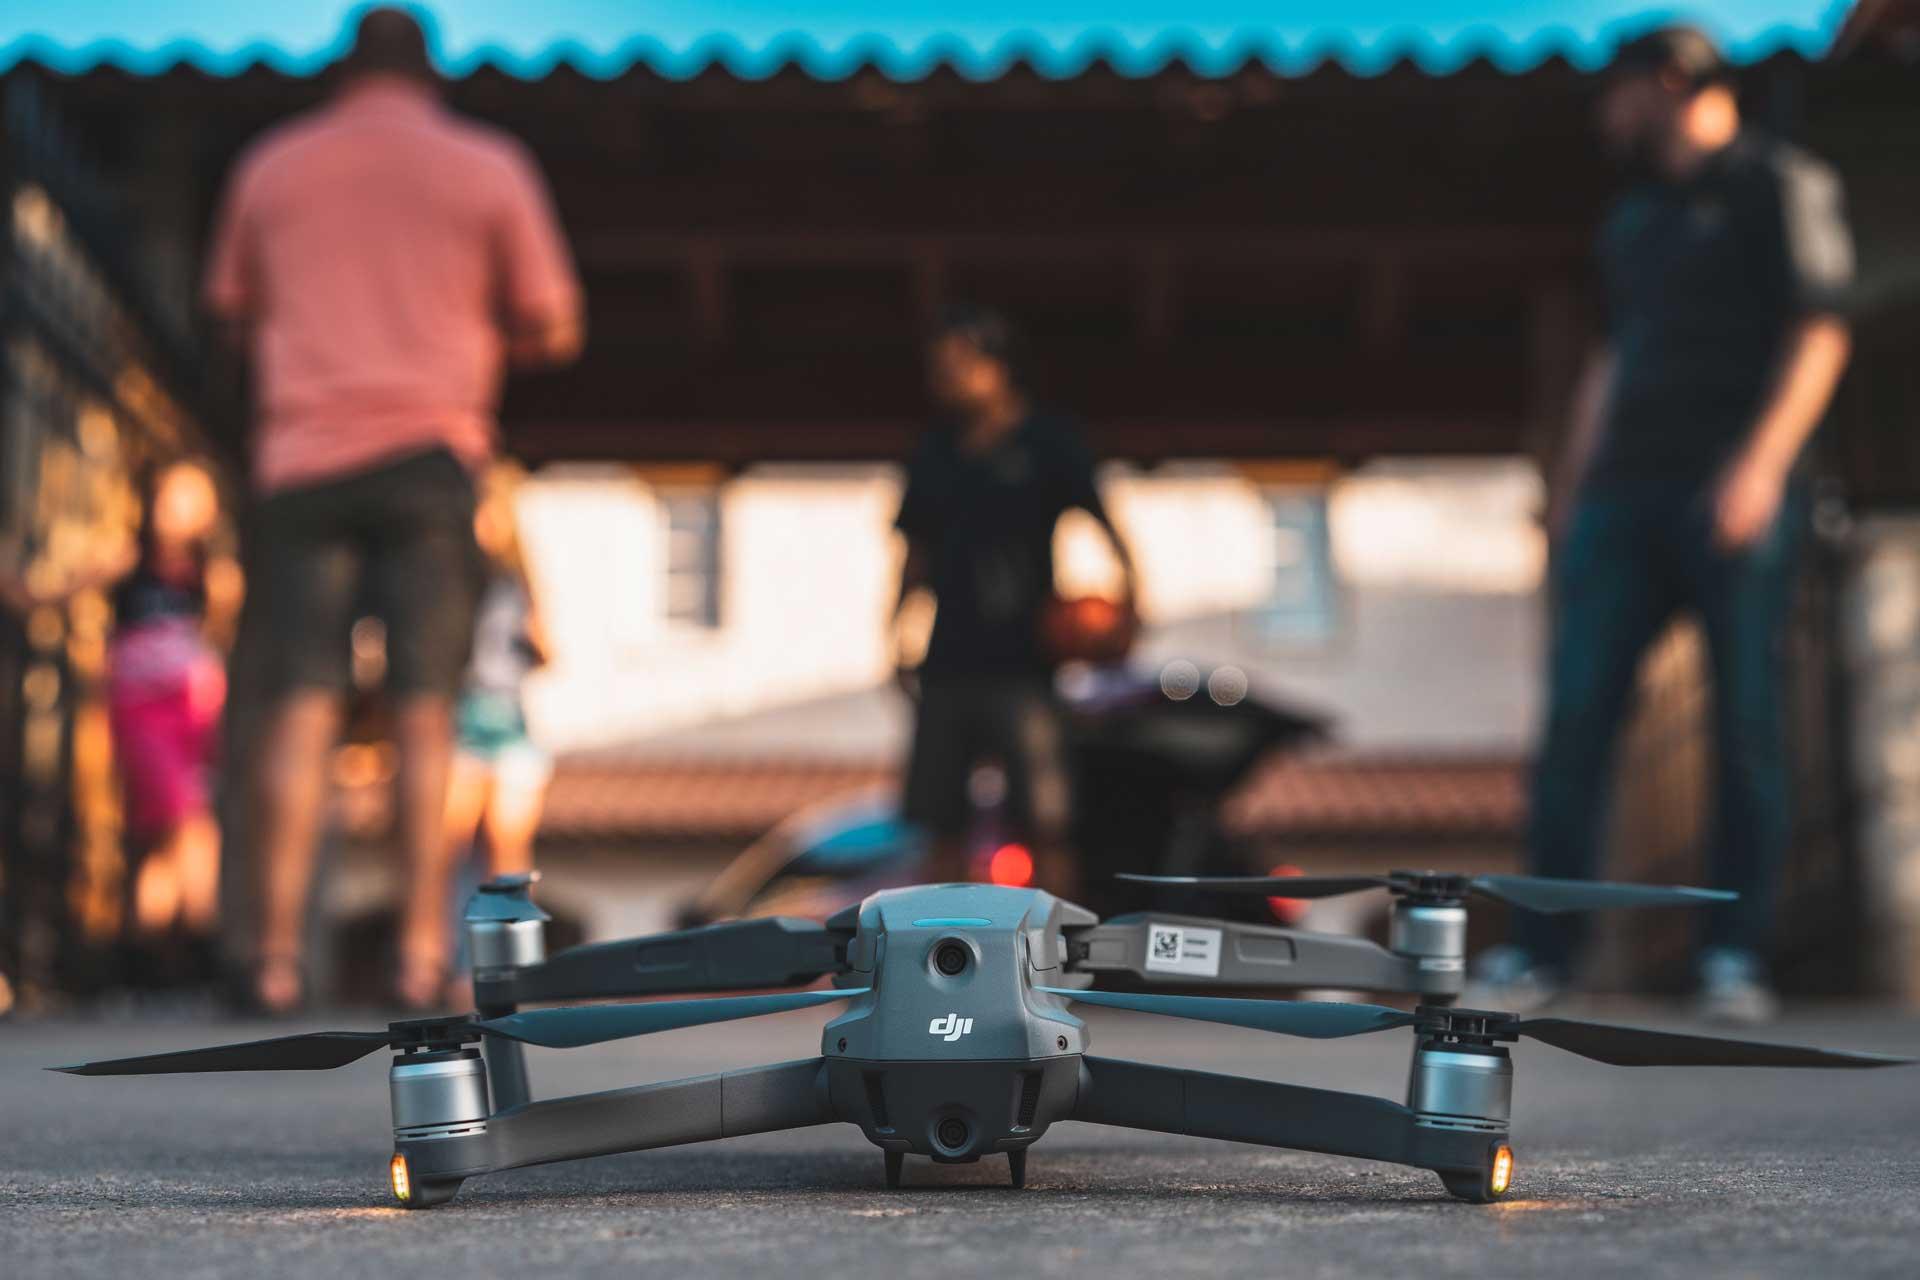 drone-flyover-creative-cannon